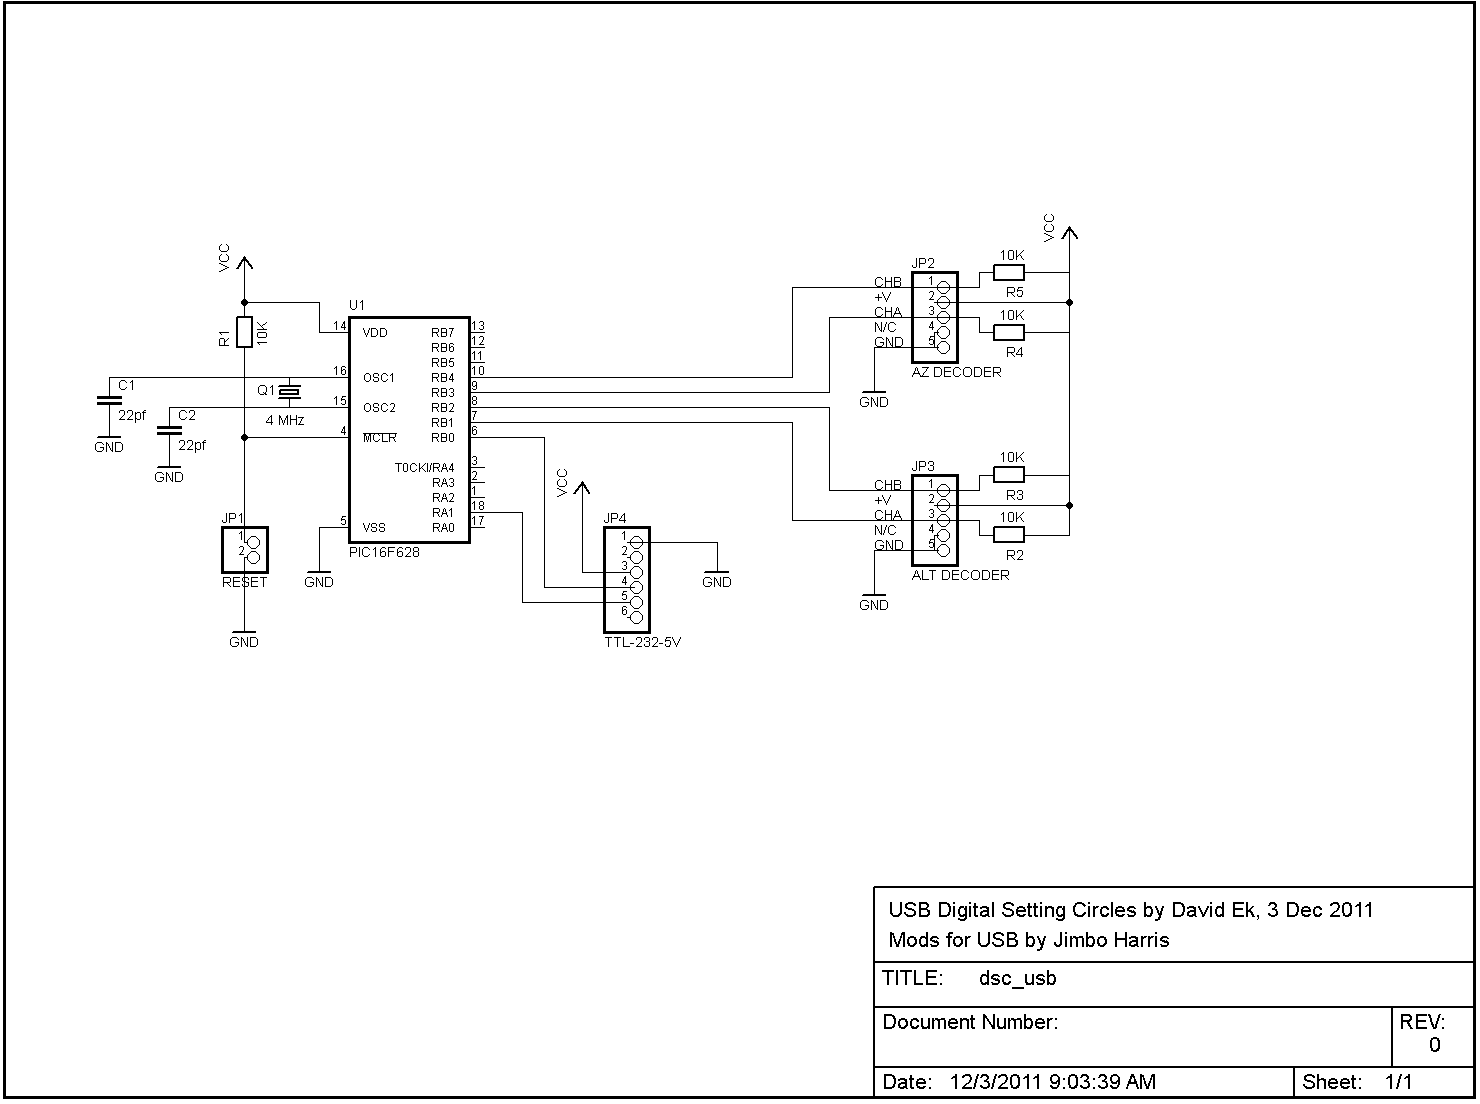 USB Digital Setting Circles - schematic